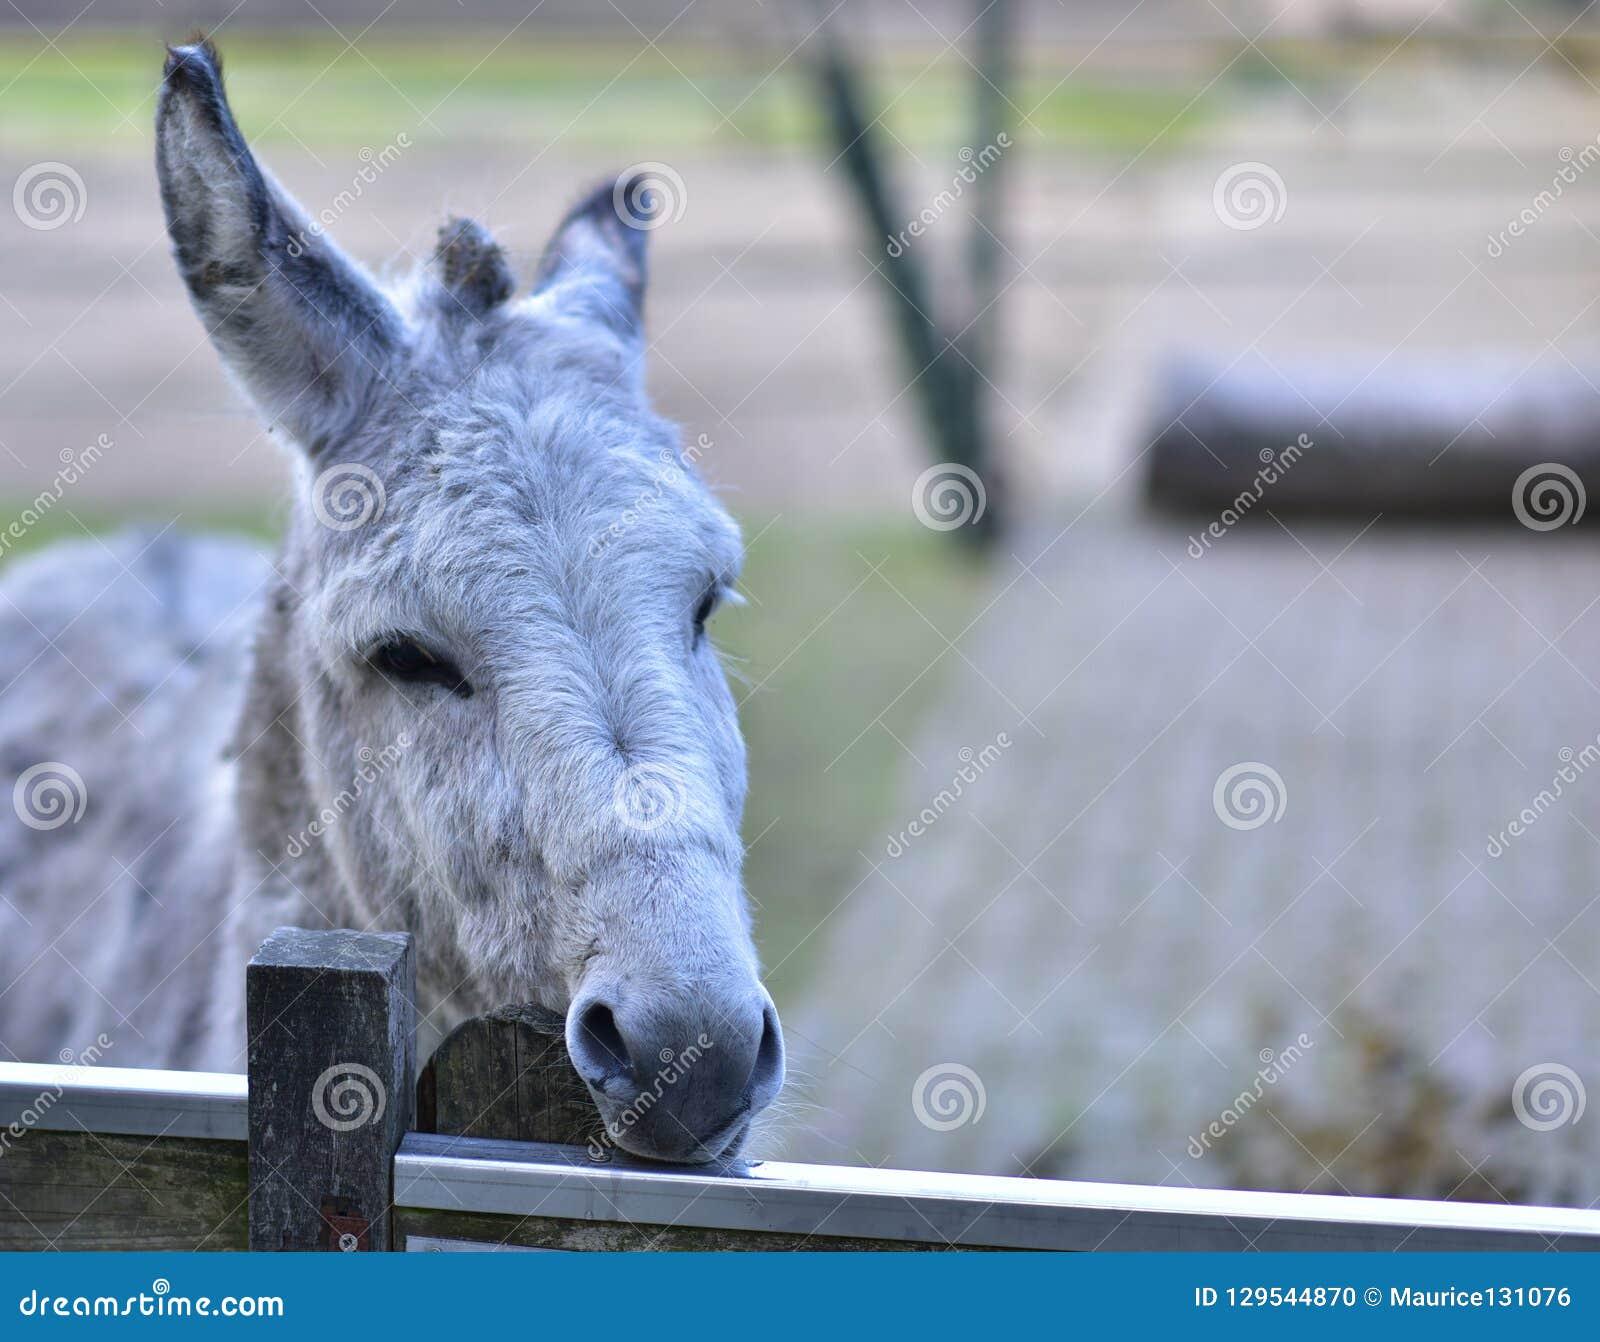 Donkey in public park during autumn season.